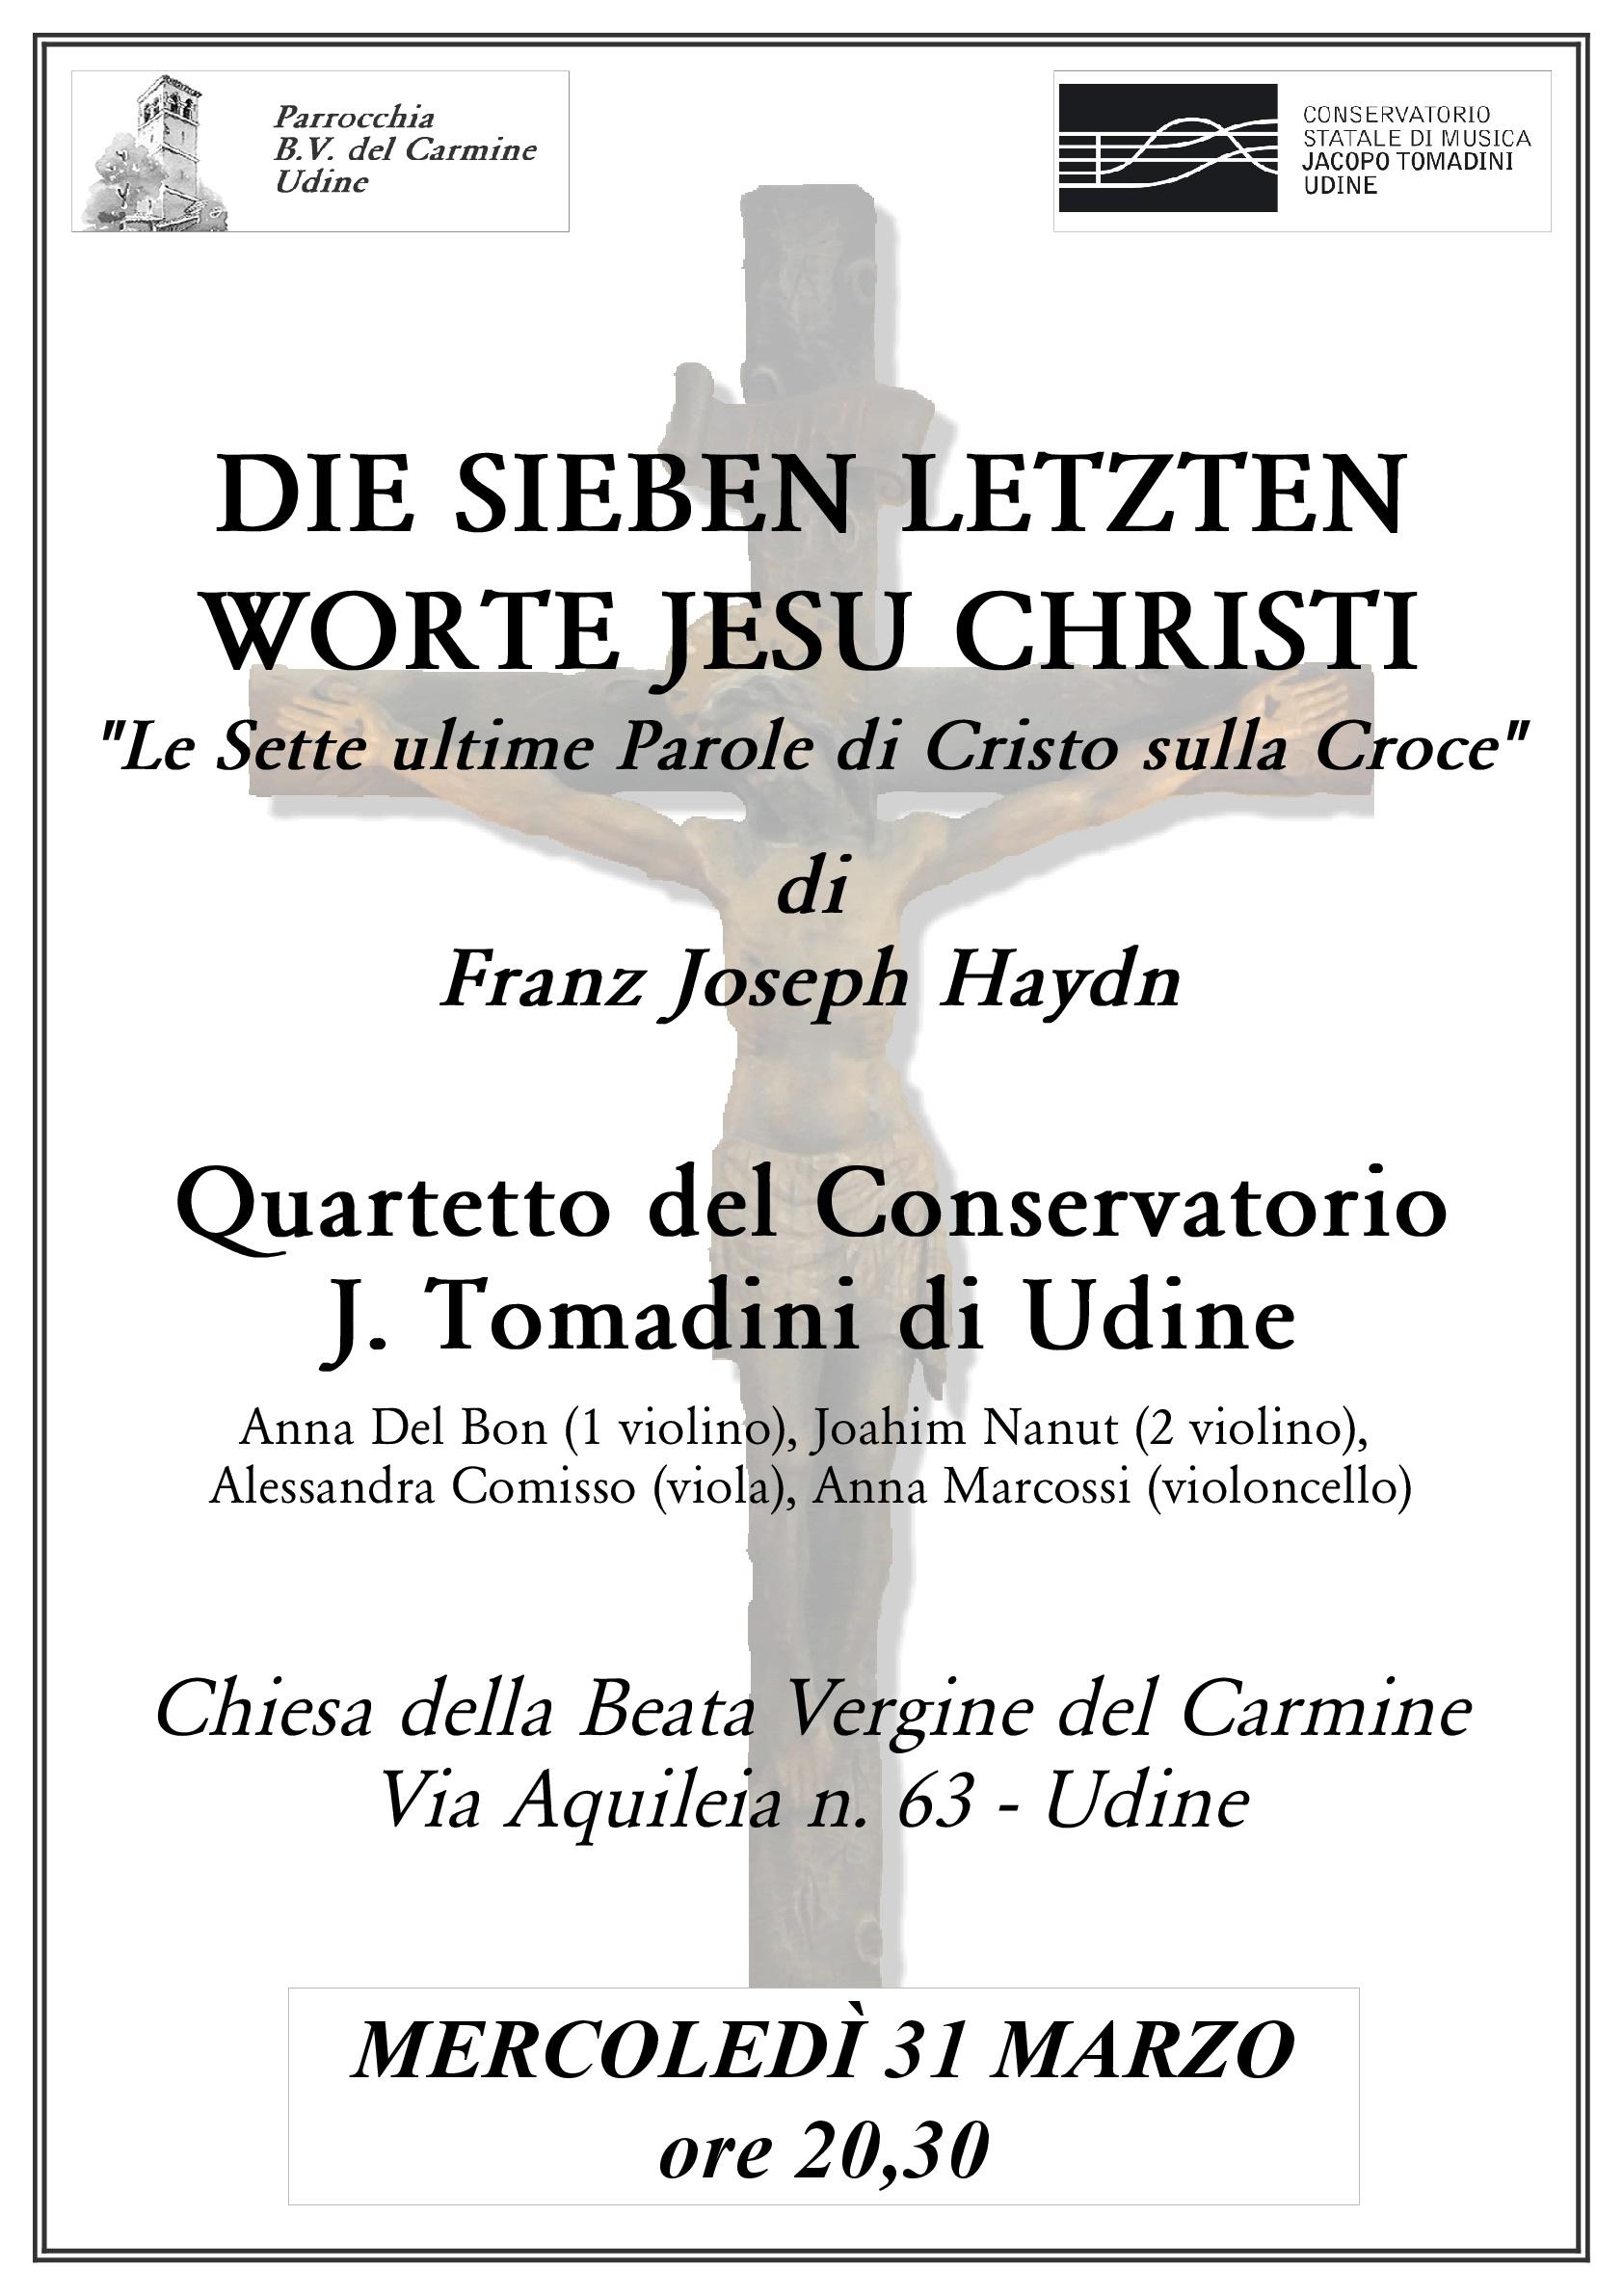 Concerto Ultime parole di Ges in croce locandina.doc-001